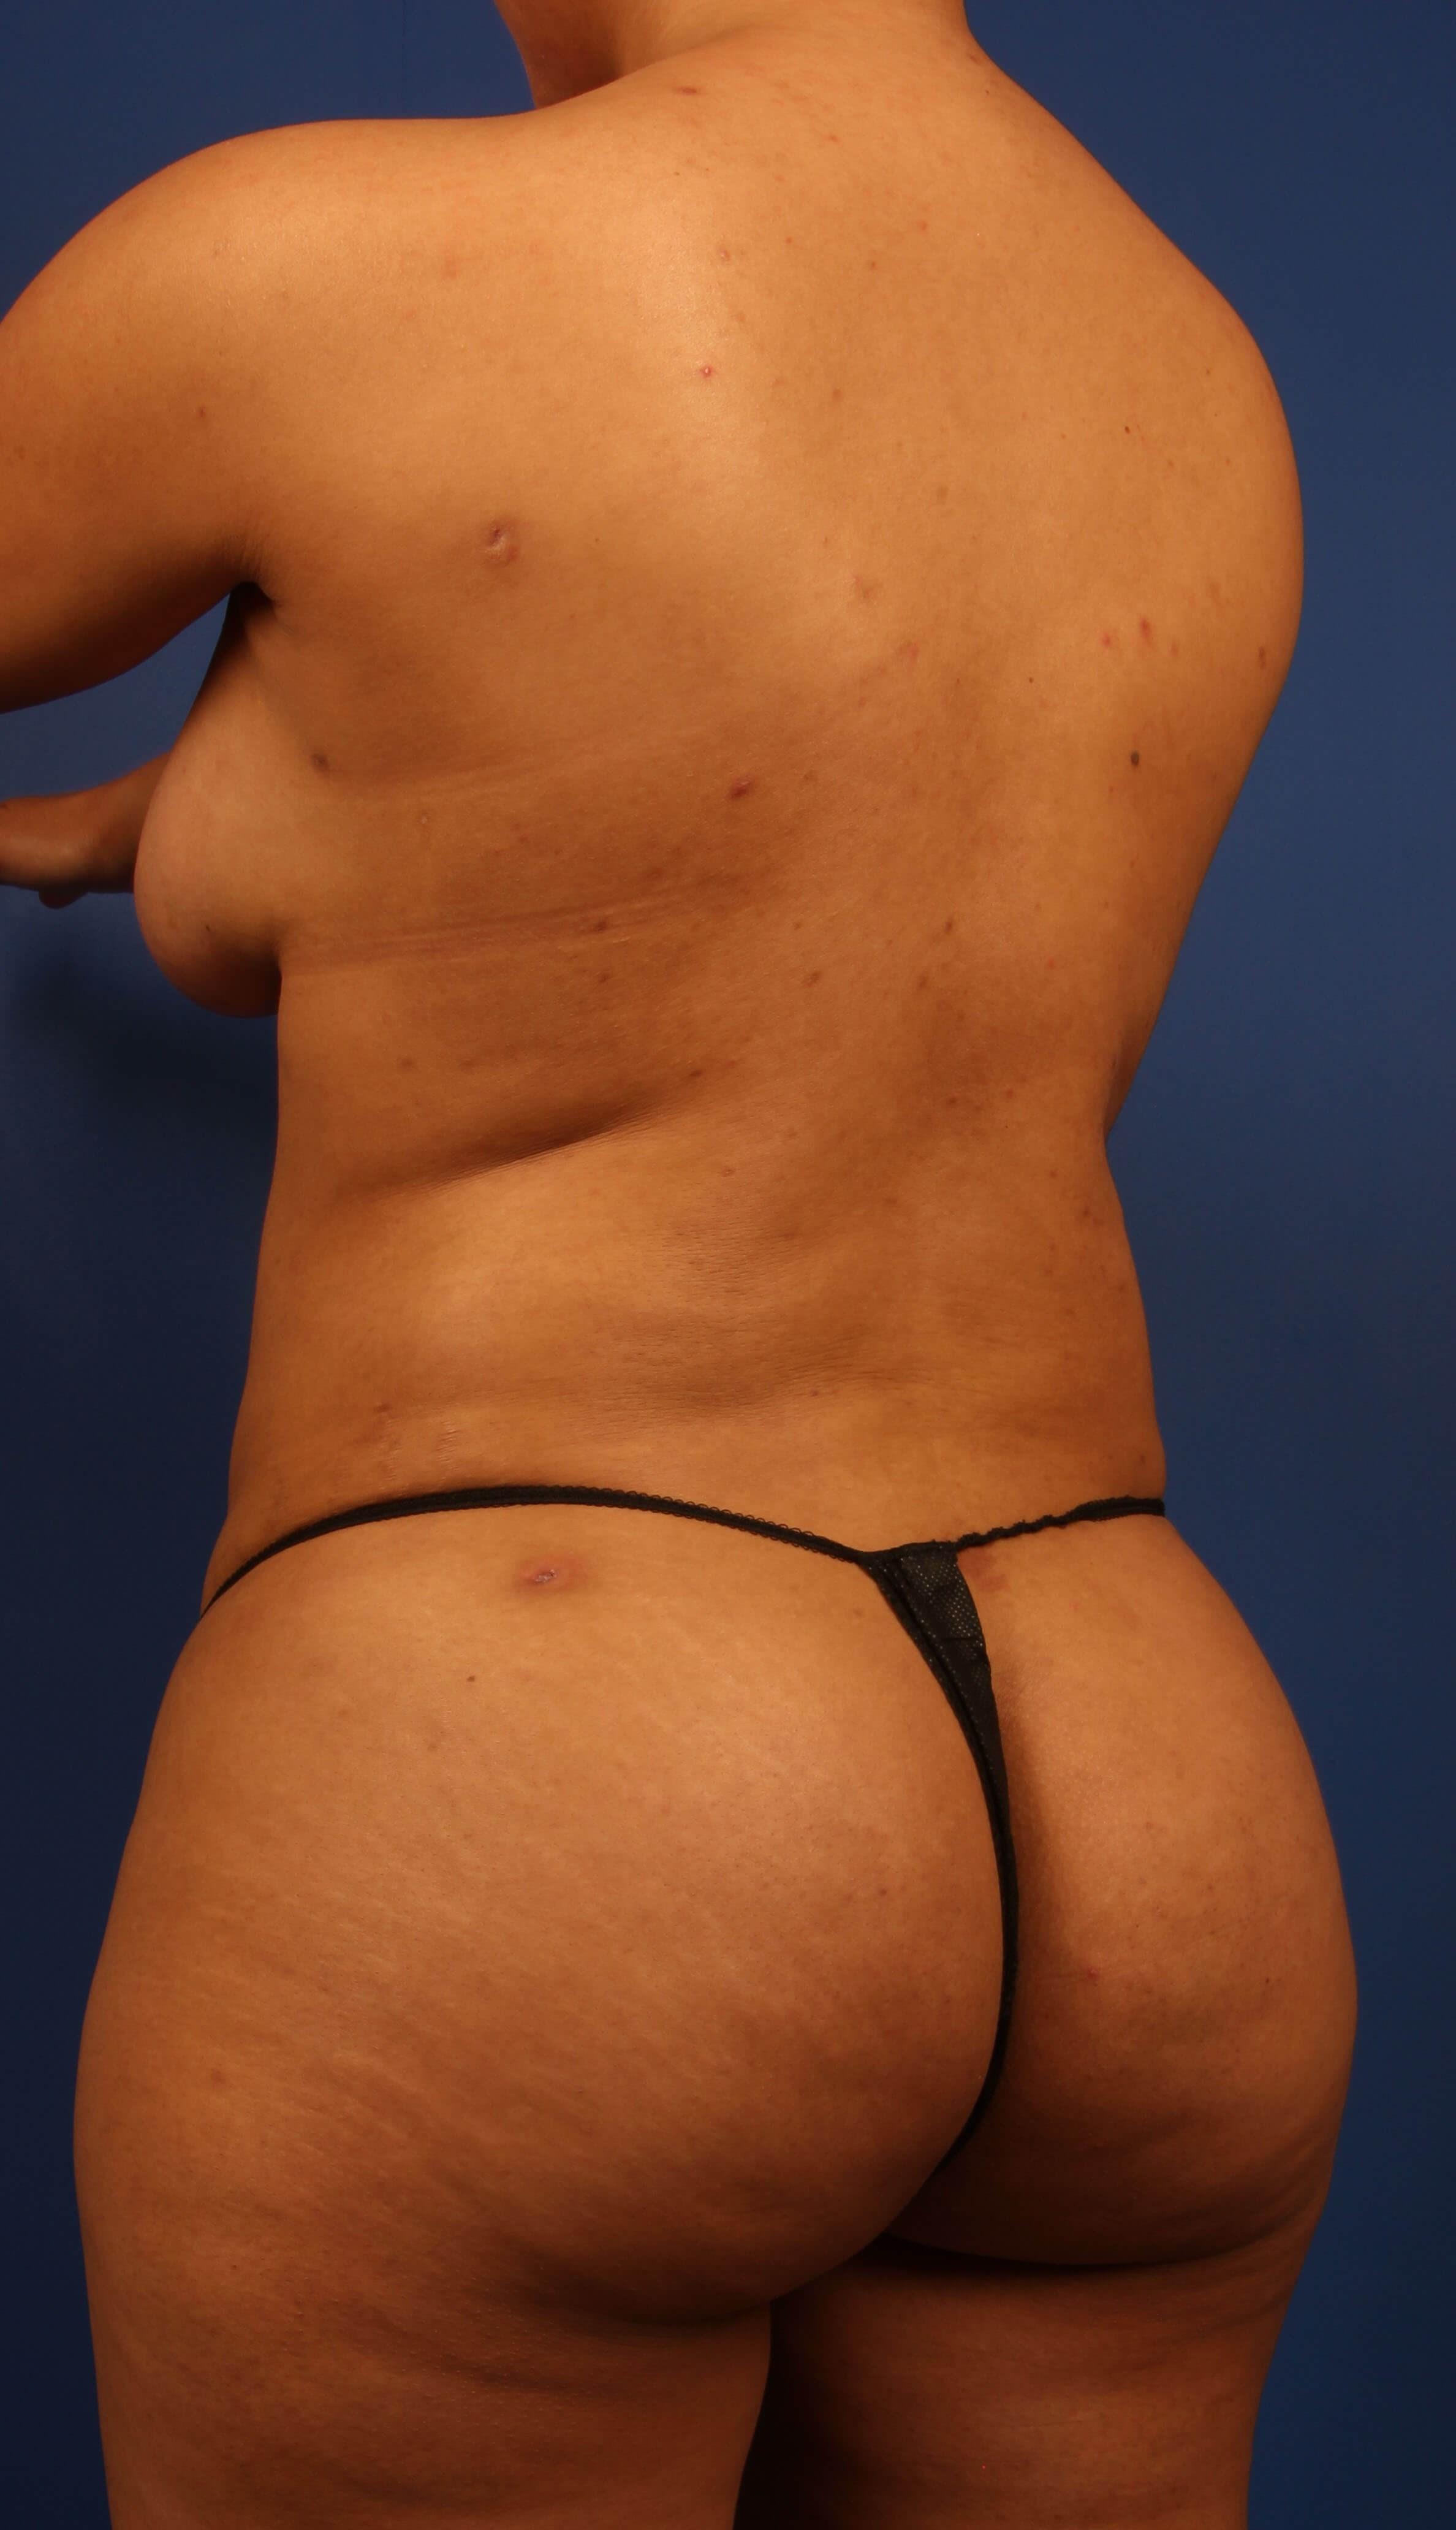 BBL fat transfer after - Scottsdale Liposuction BBL